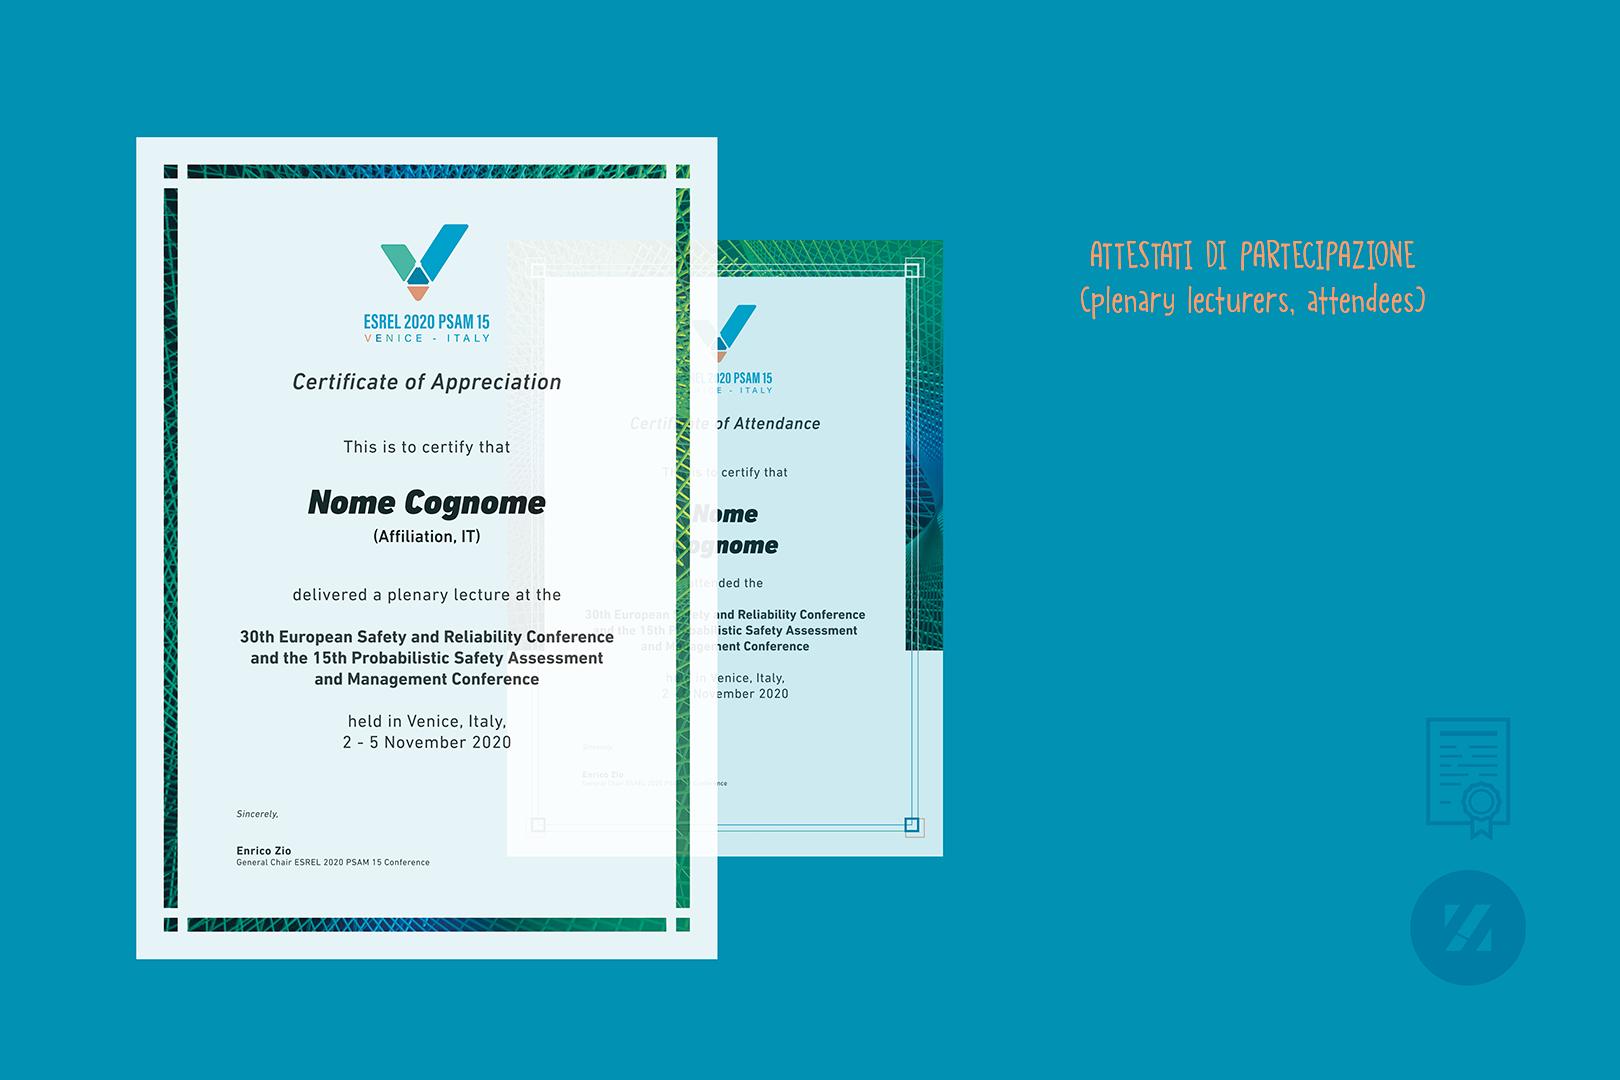 Roberto Zanoletti-PoliMi-Esrel2020-Psam15 Certificati